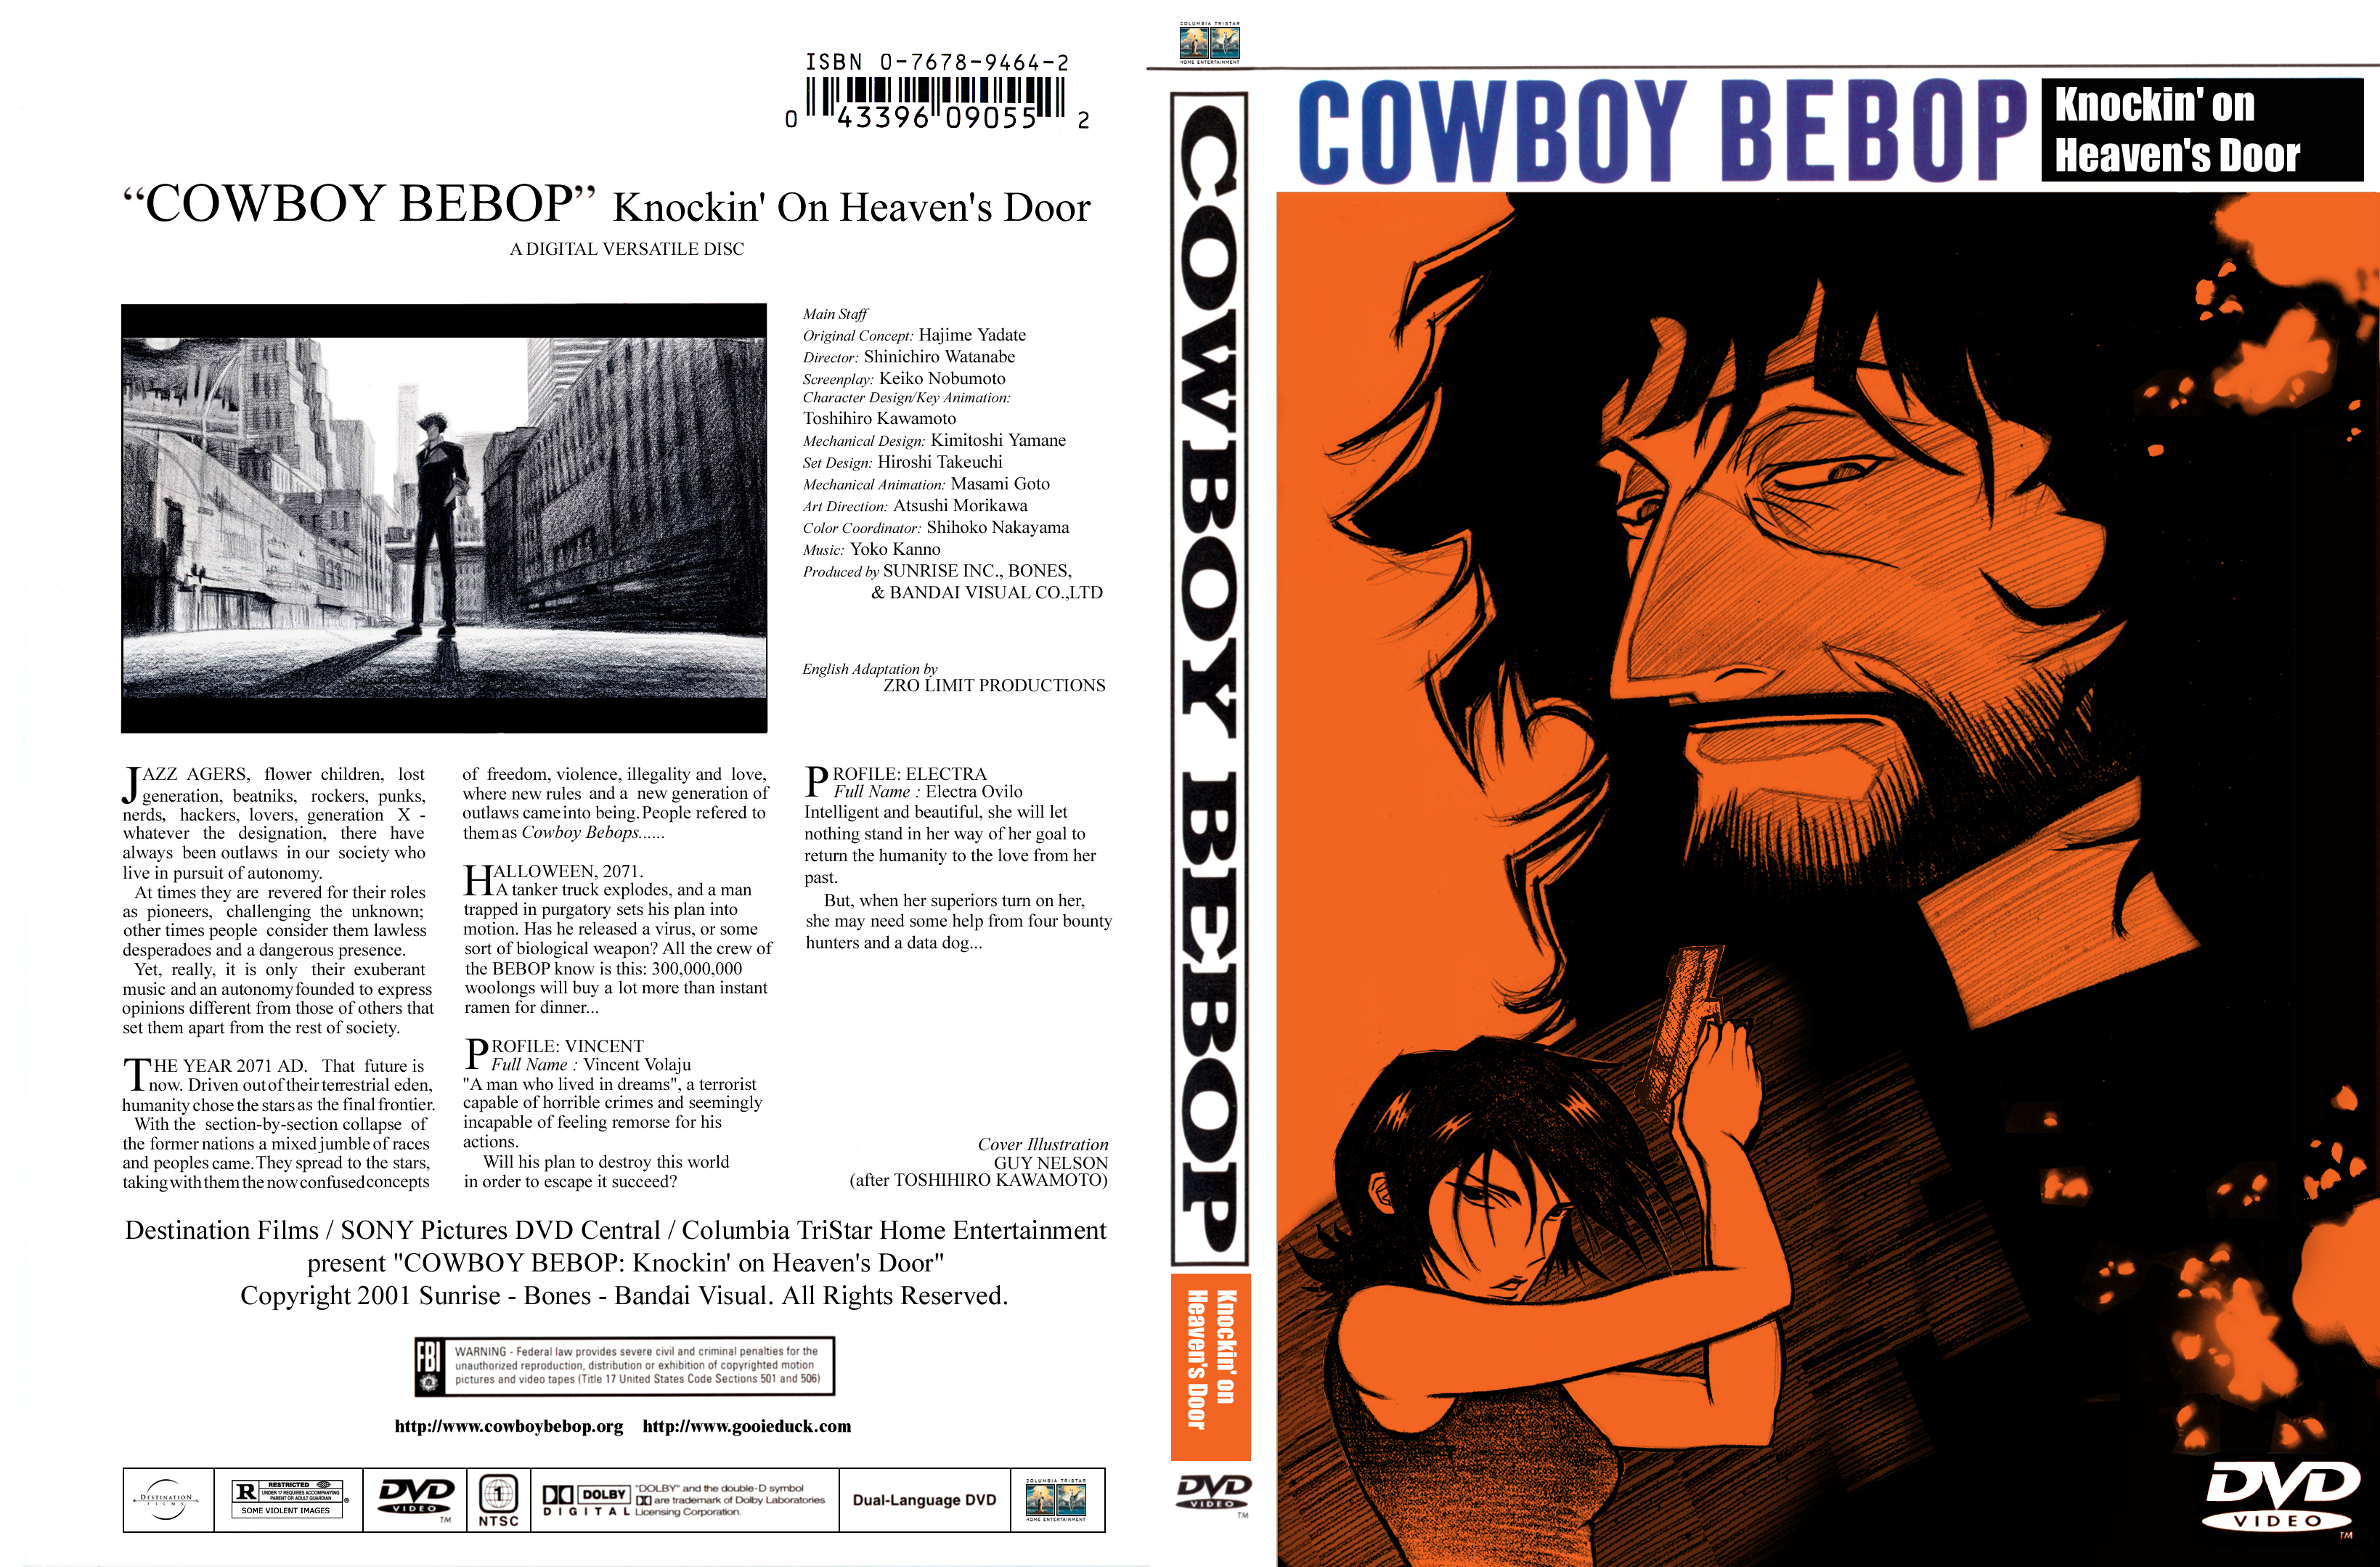 guy nelsons cowboy bebop kohd dvd bluray cover